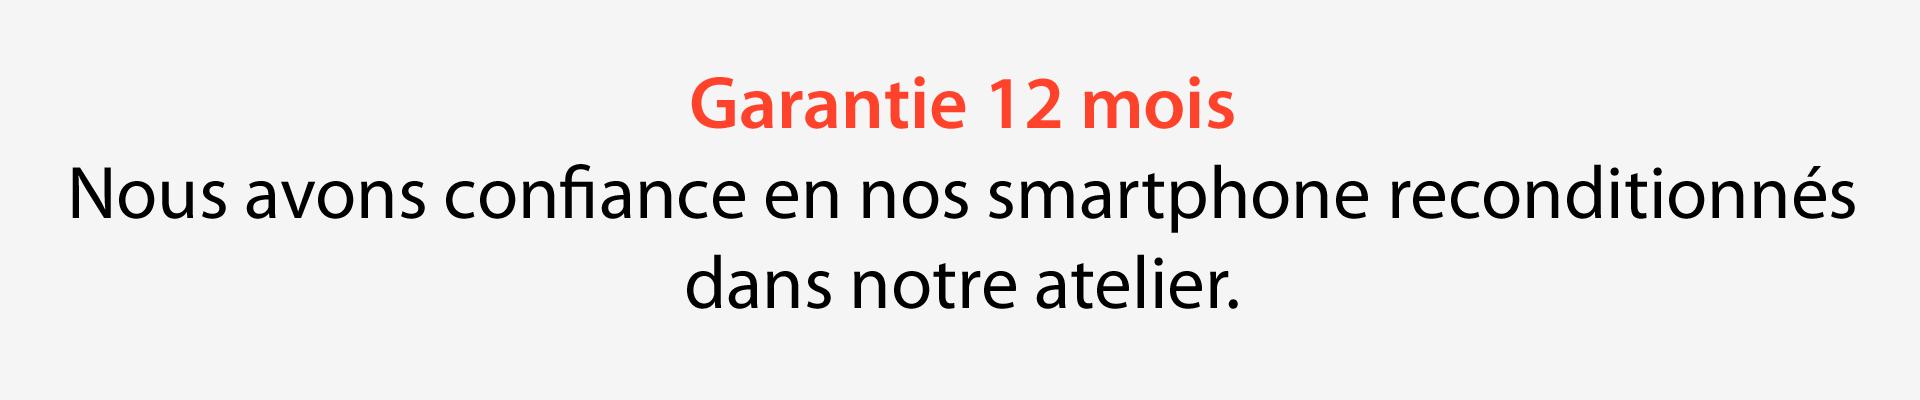 garantie 12 mois smartphone recondtionné